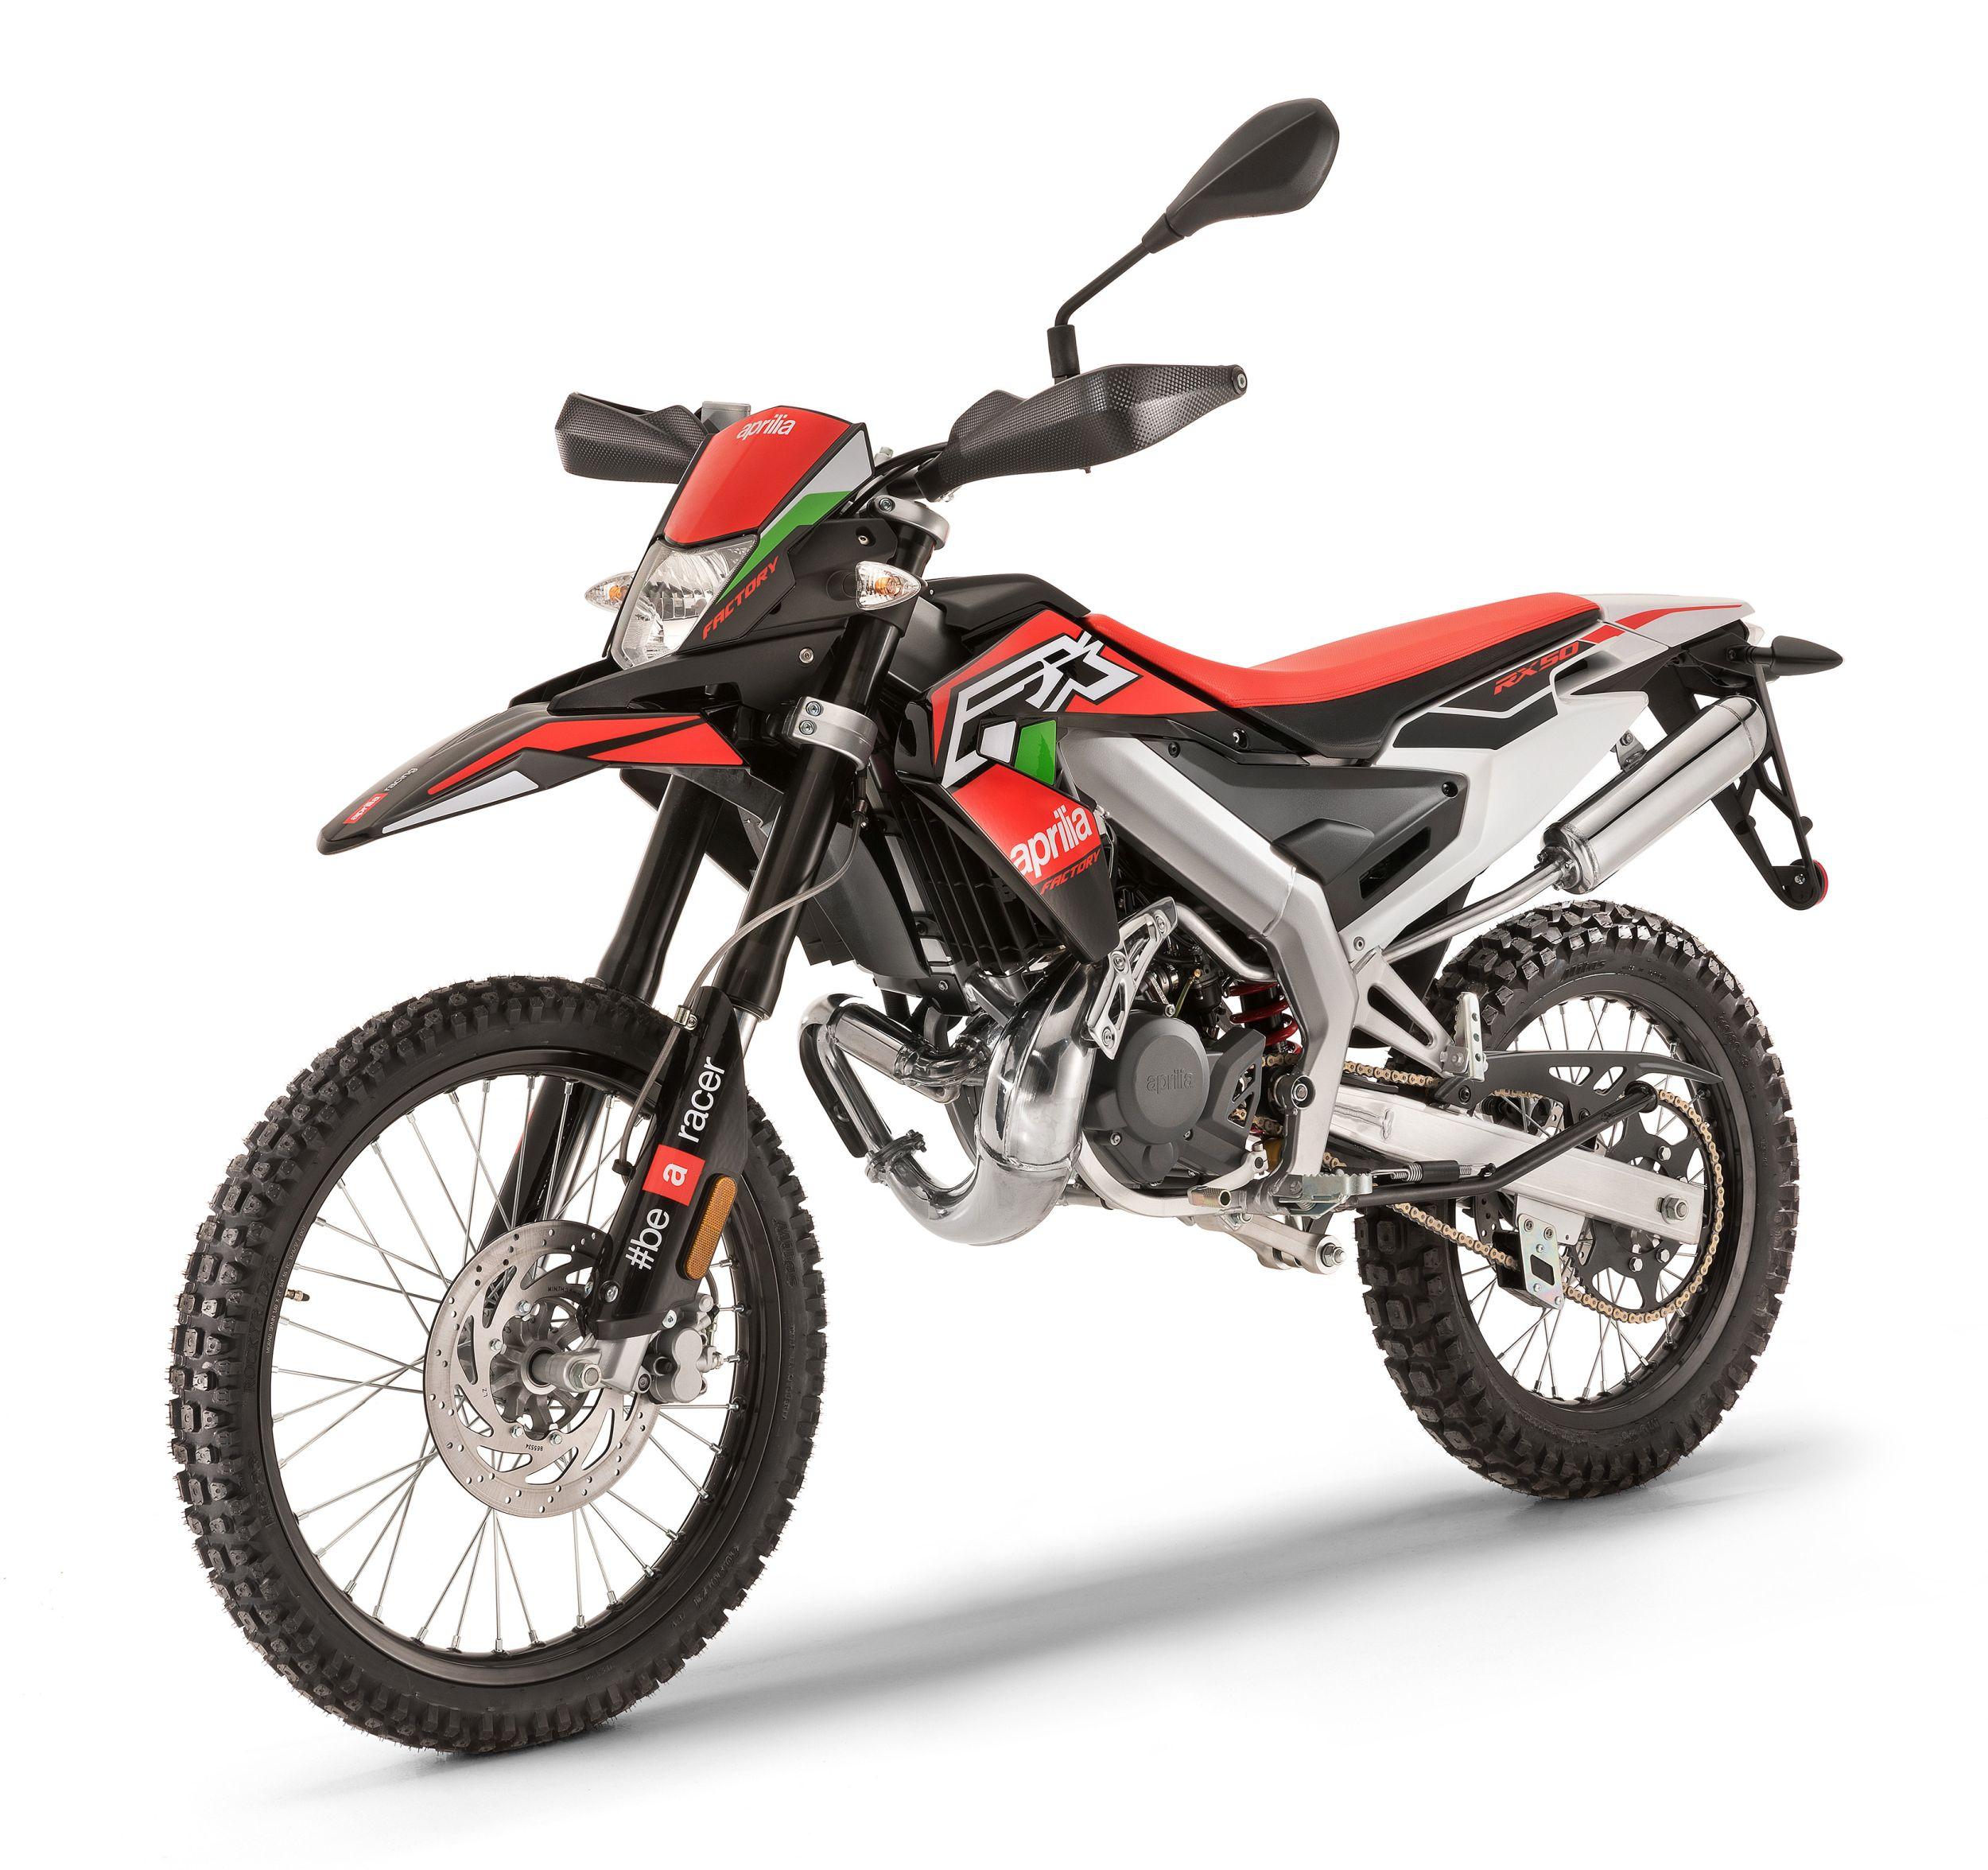 Ktm Motorcycle Gear